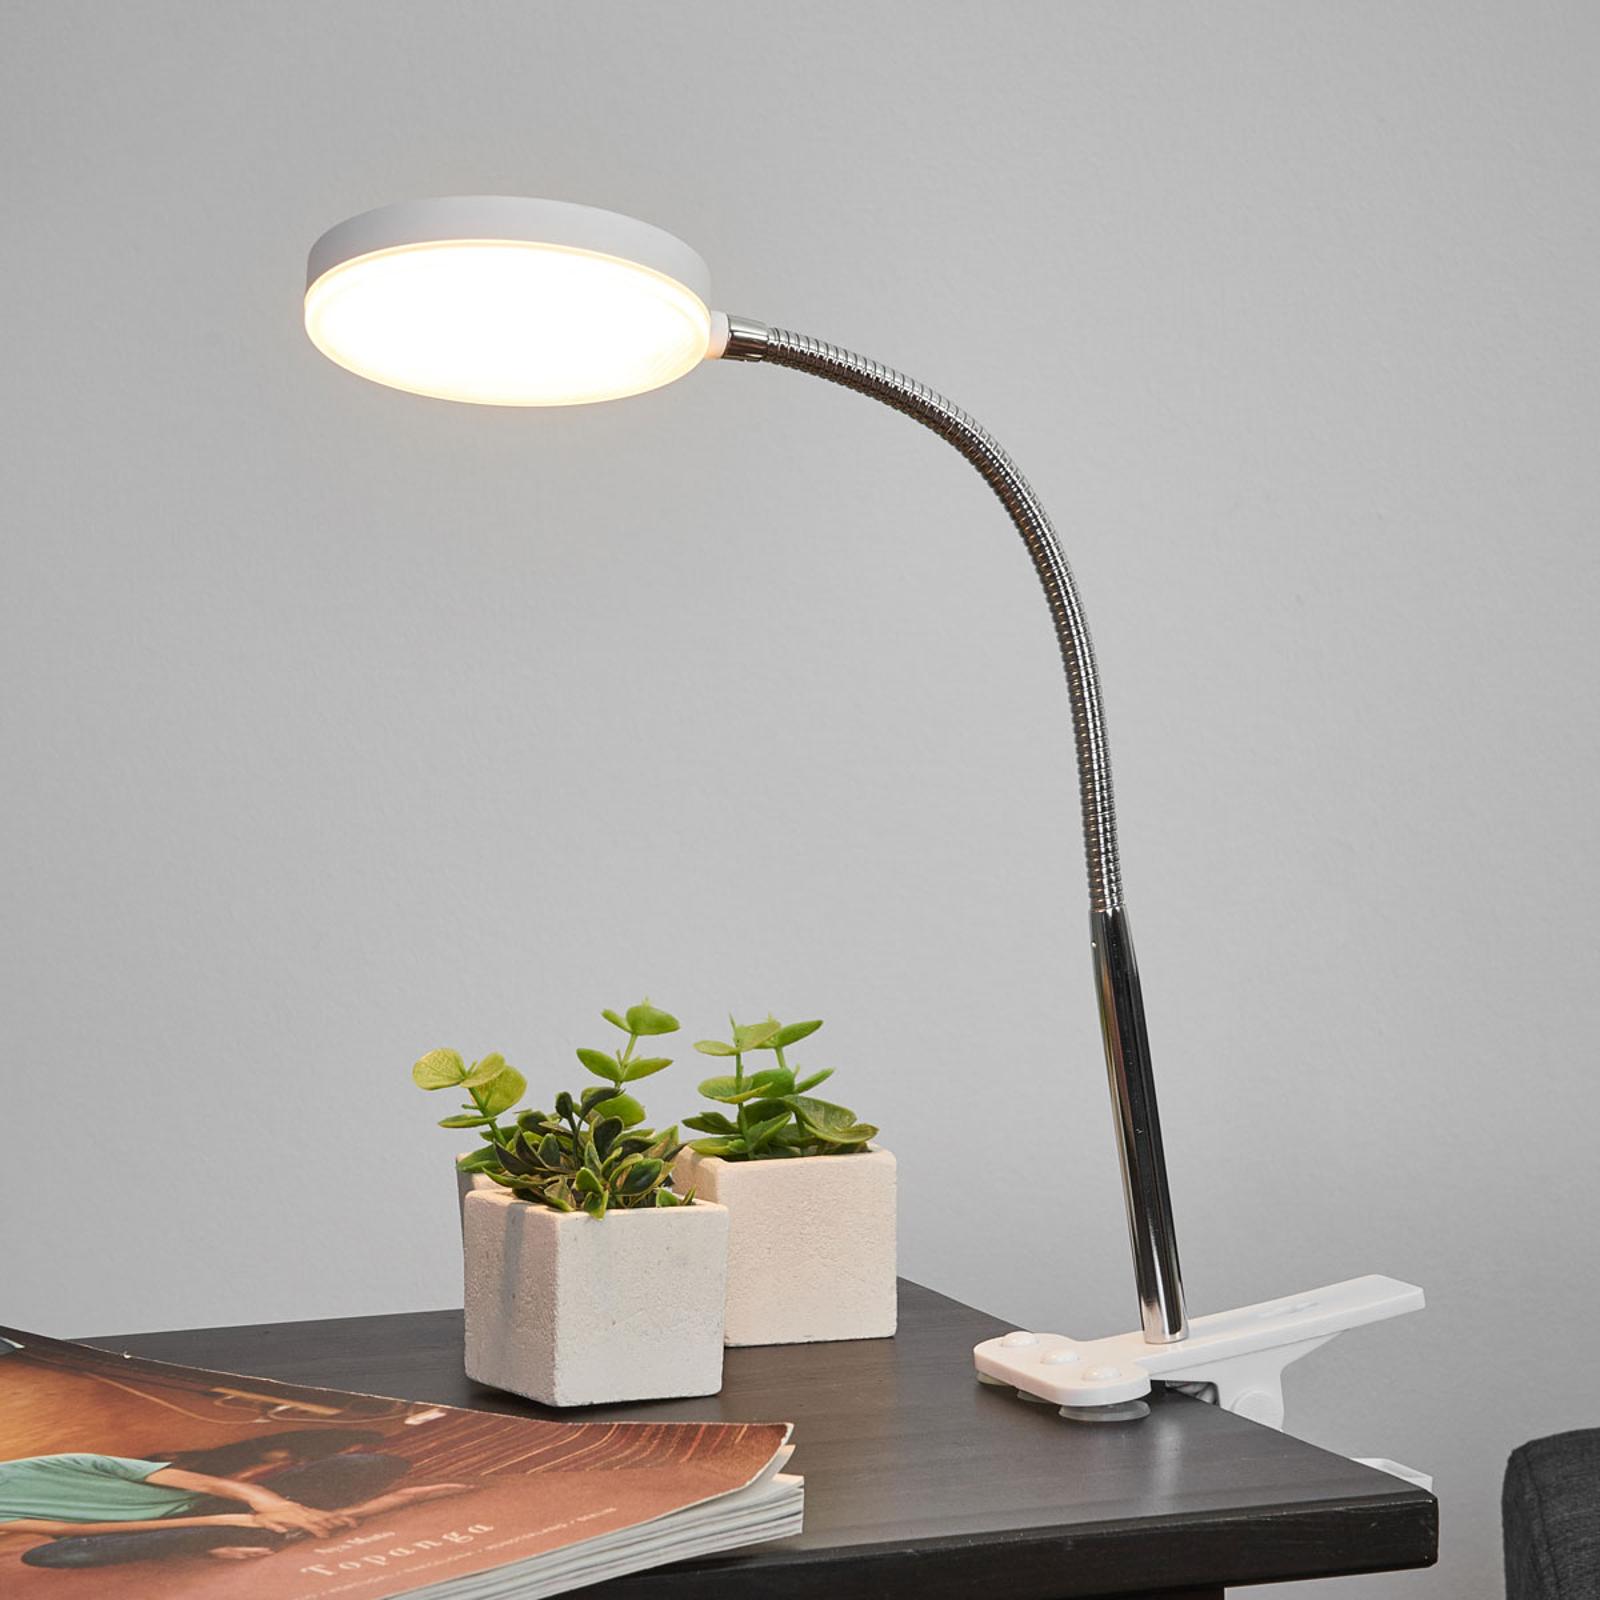 Flexo con pinza Milow con LED y brazo flexible